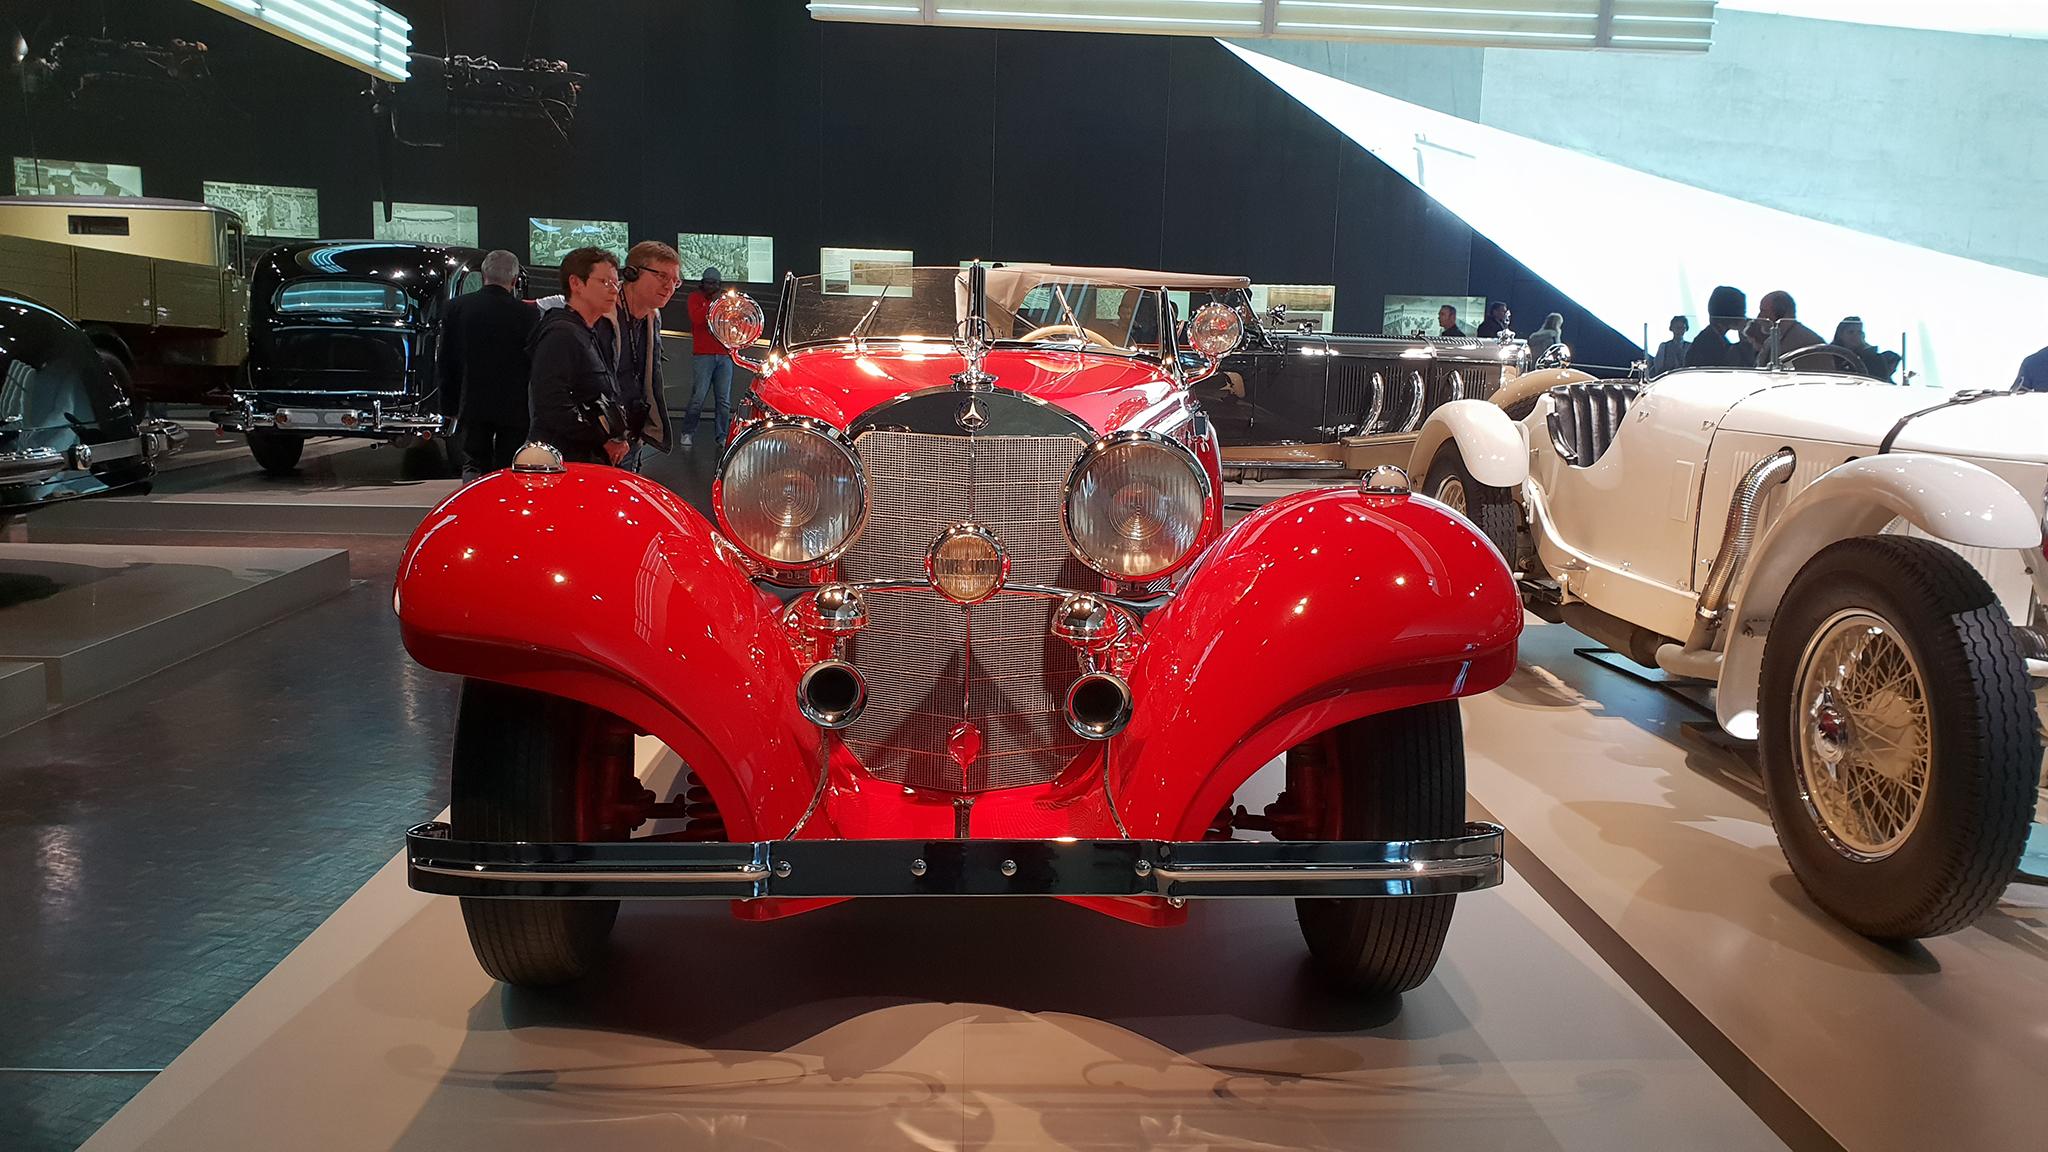 S9-Mercedes-Benz Museum-tinhte-78.jpg